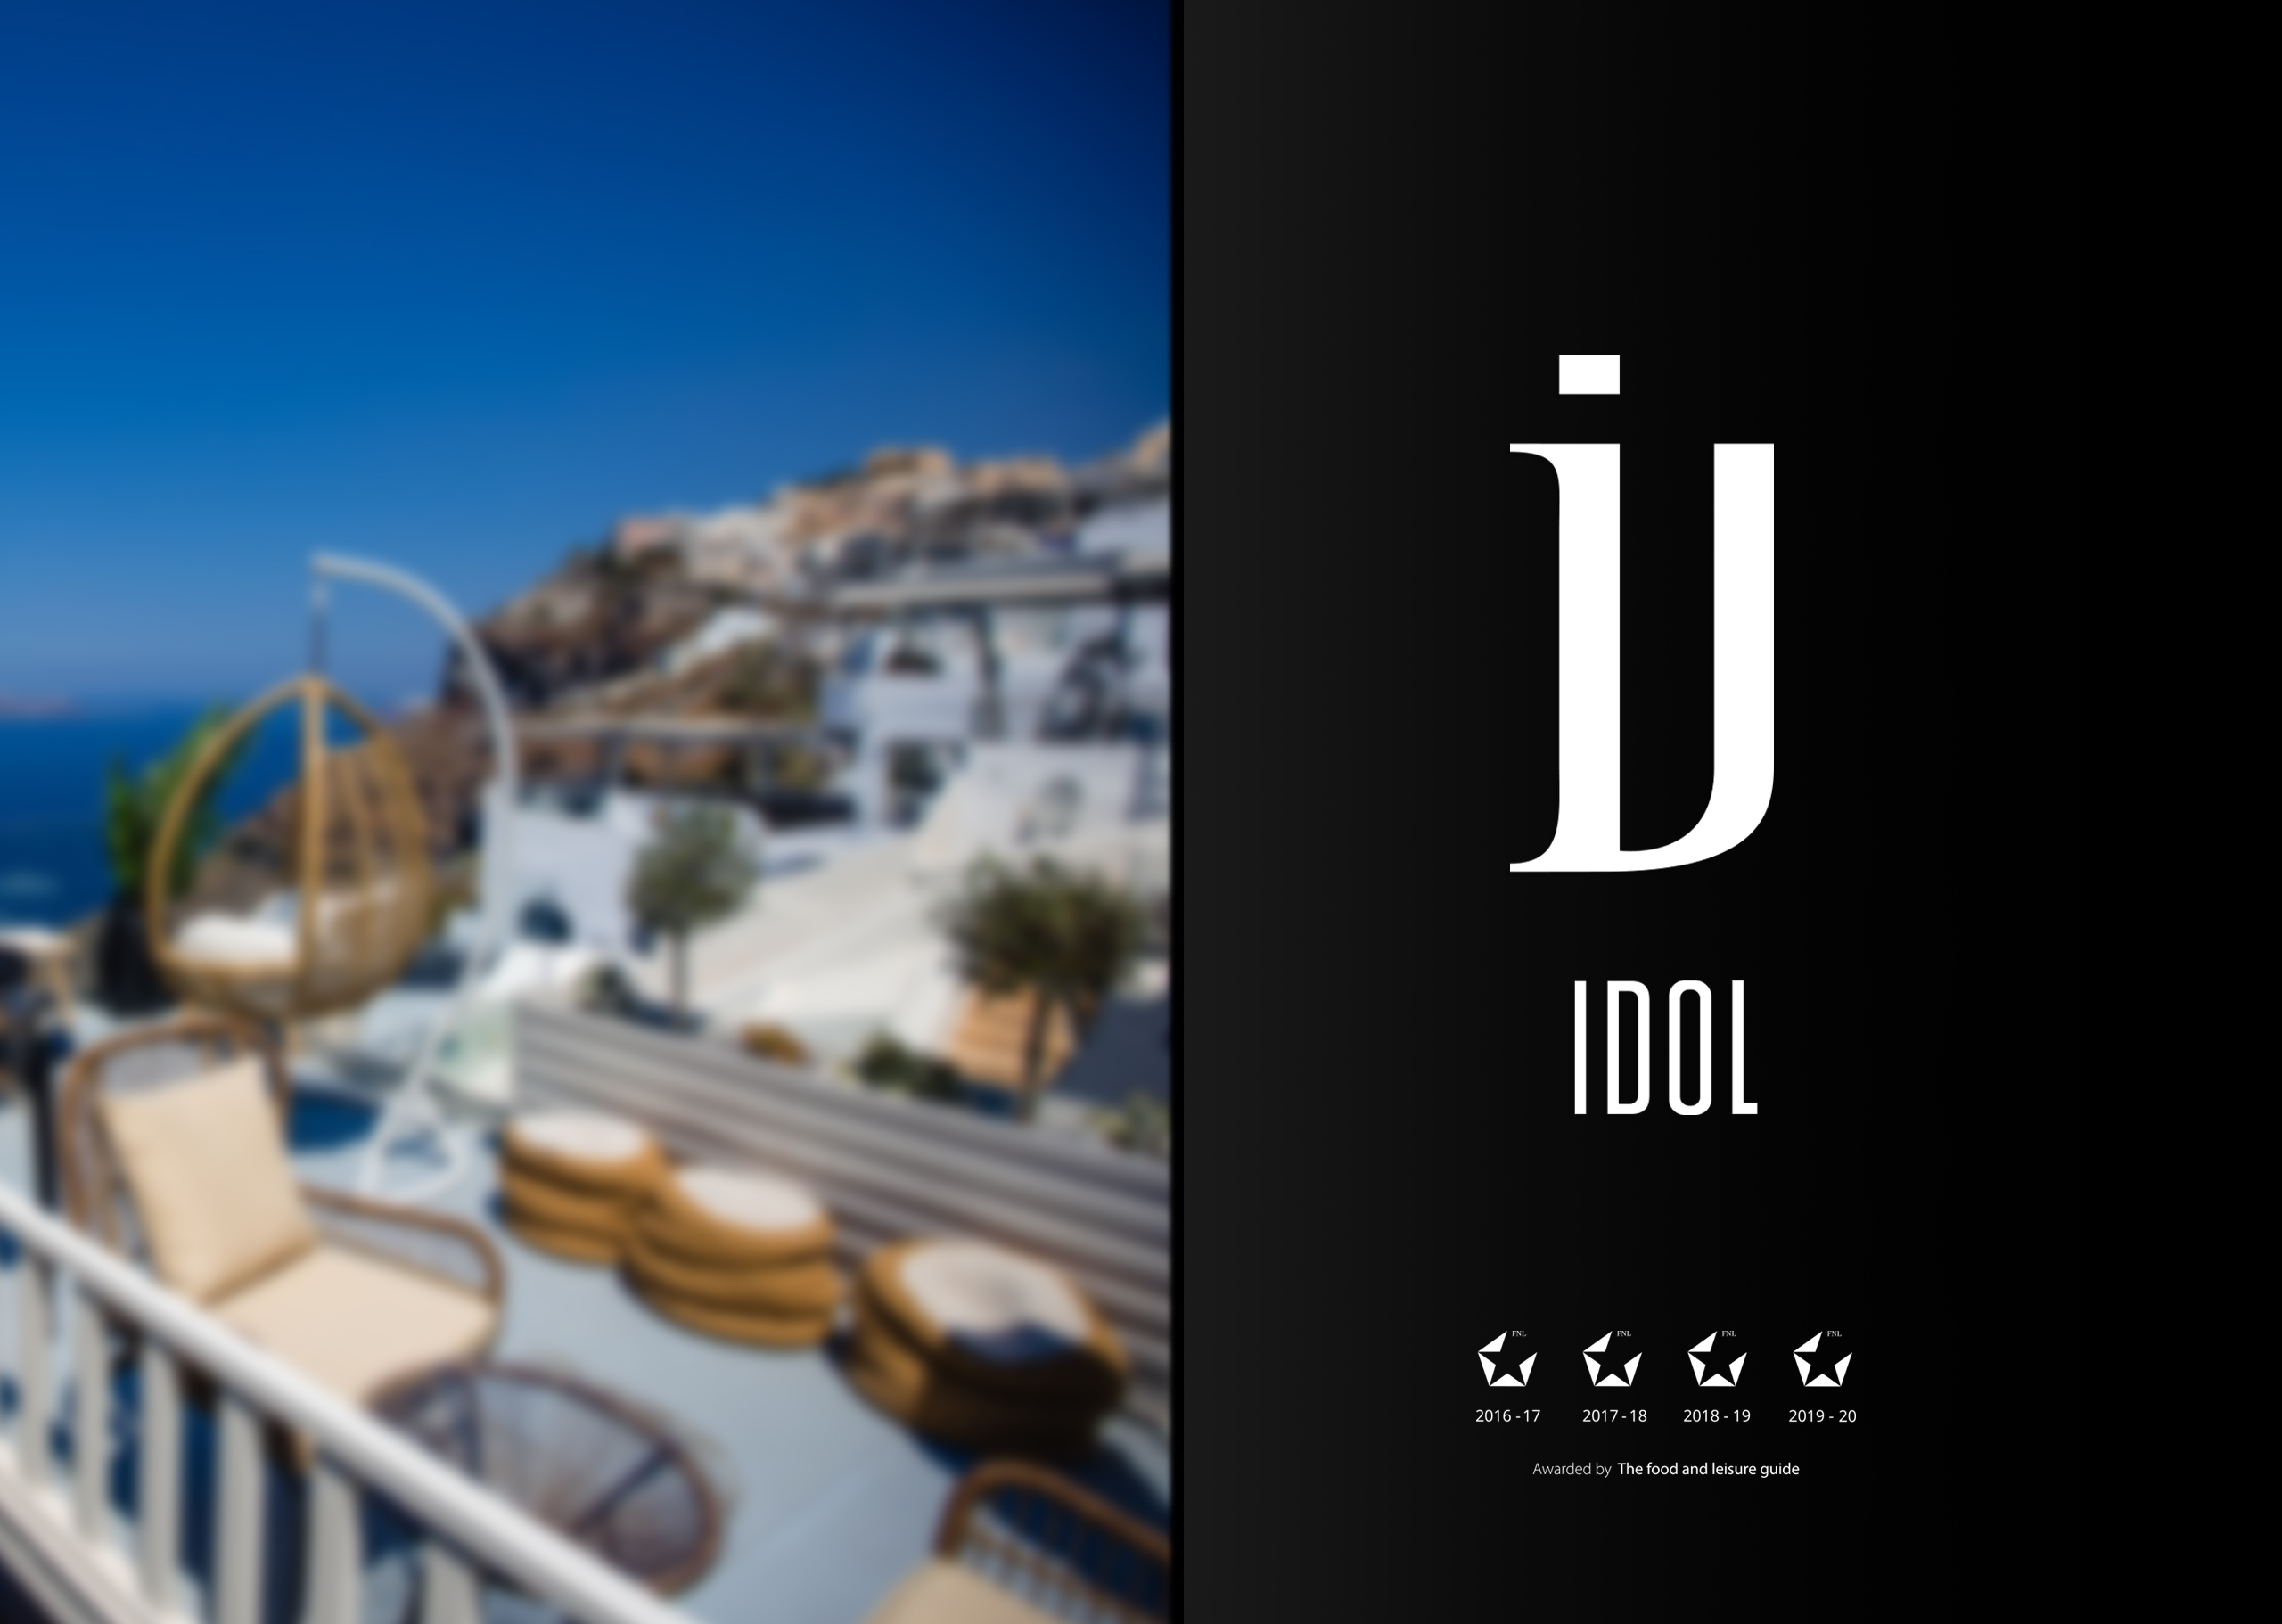 Idol Restaurant